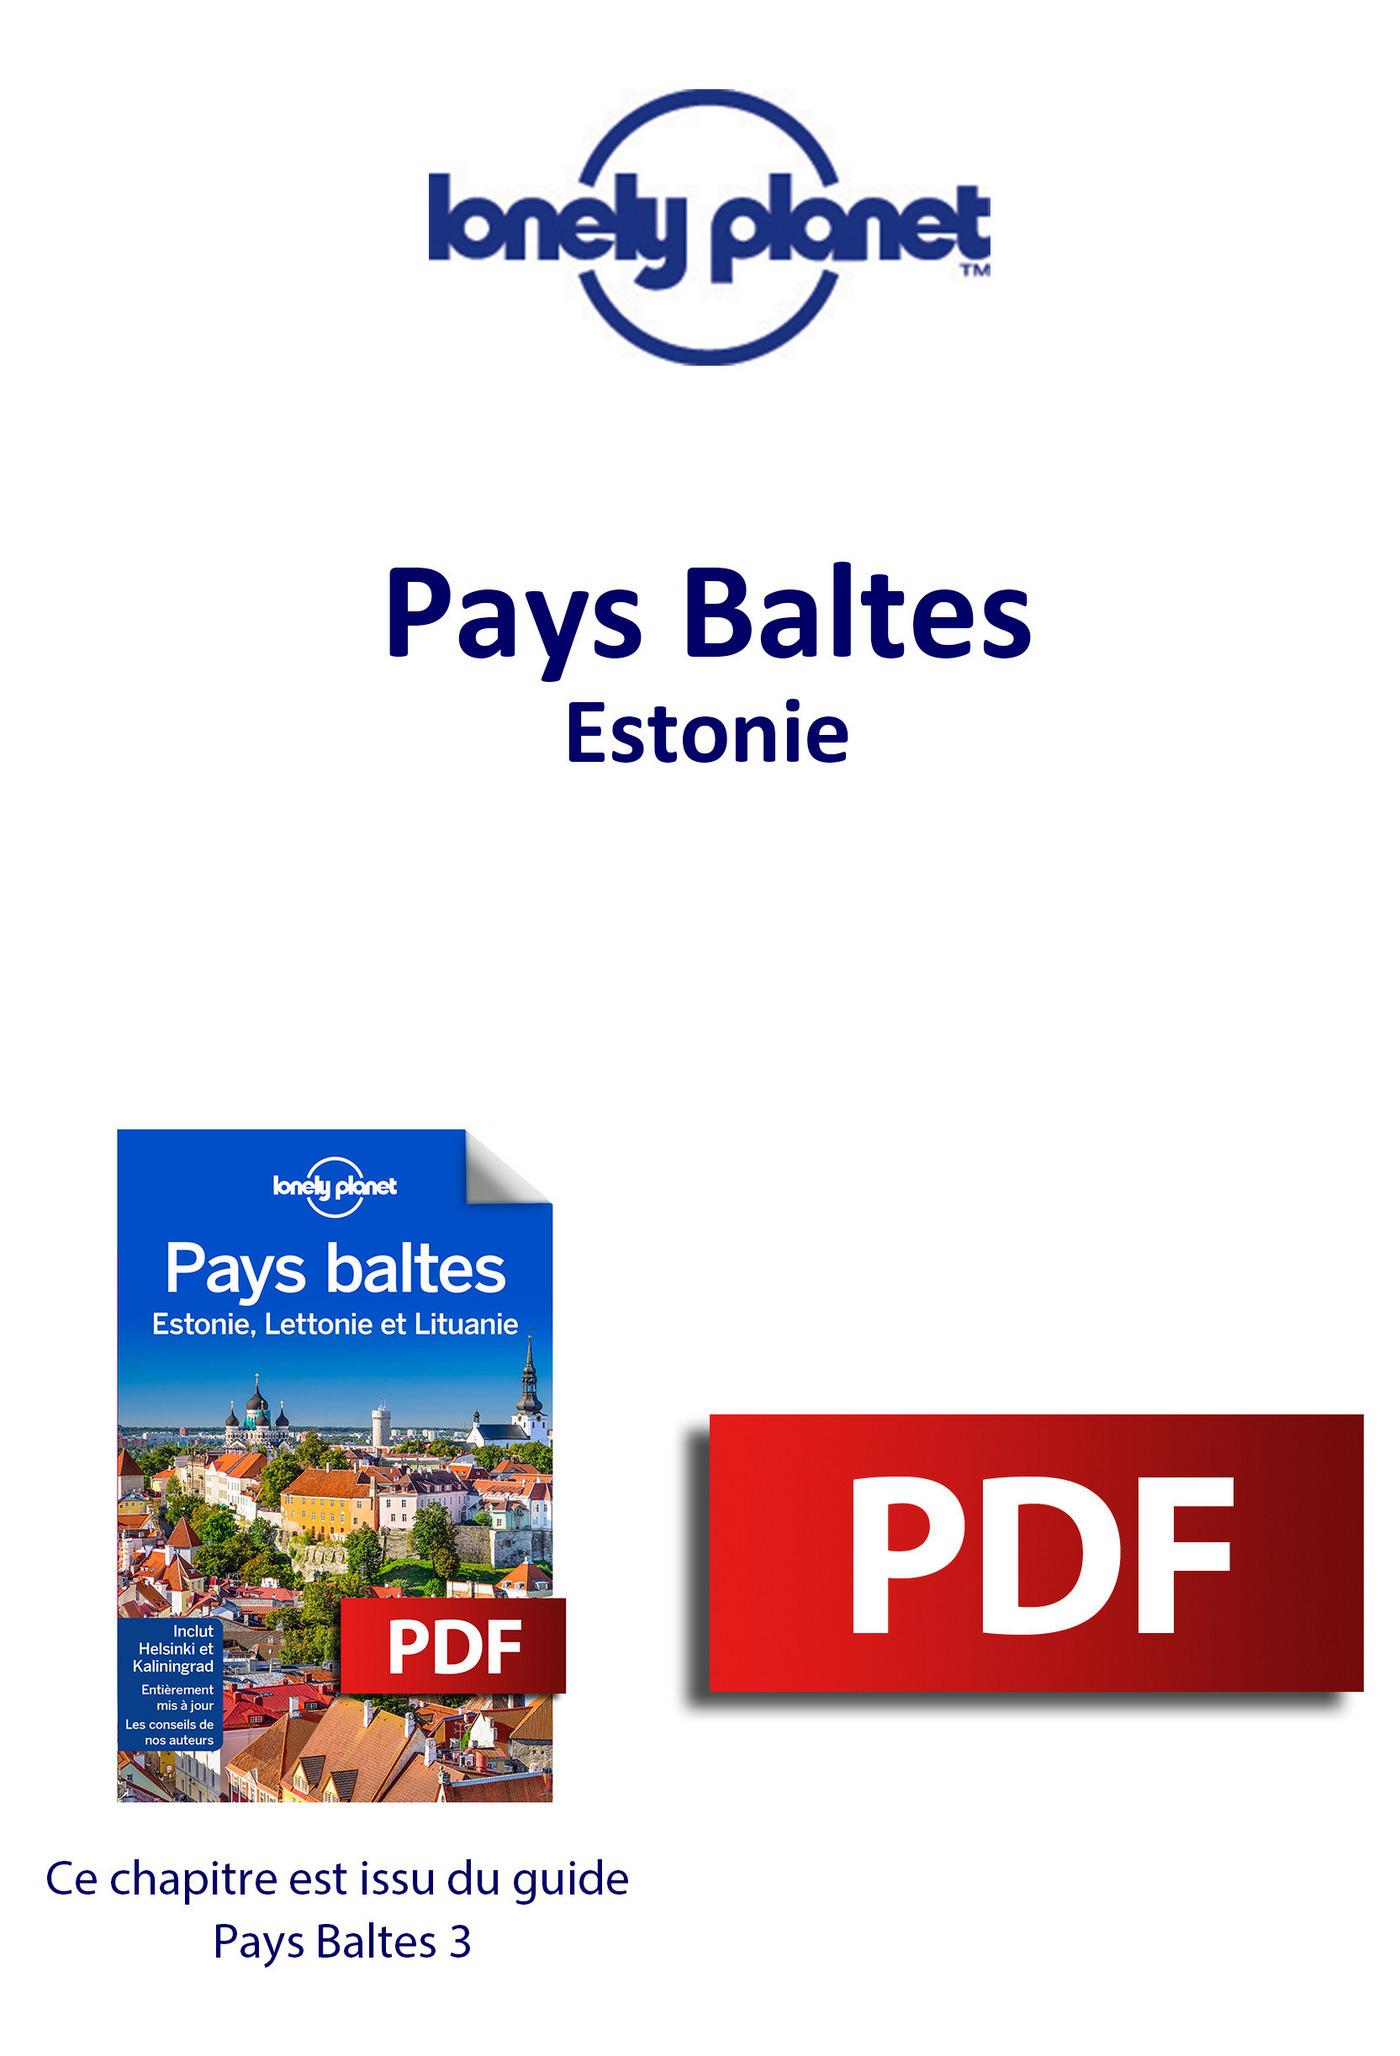 Pays Baltes - Estonie